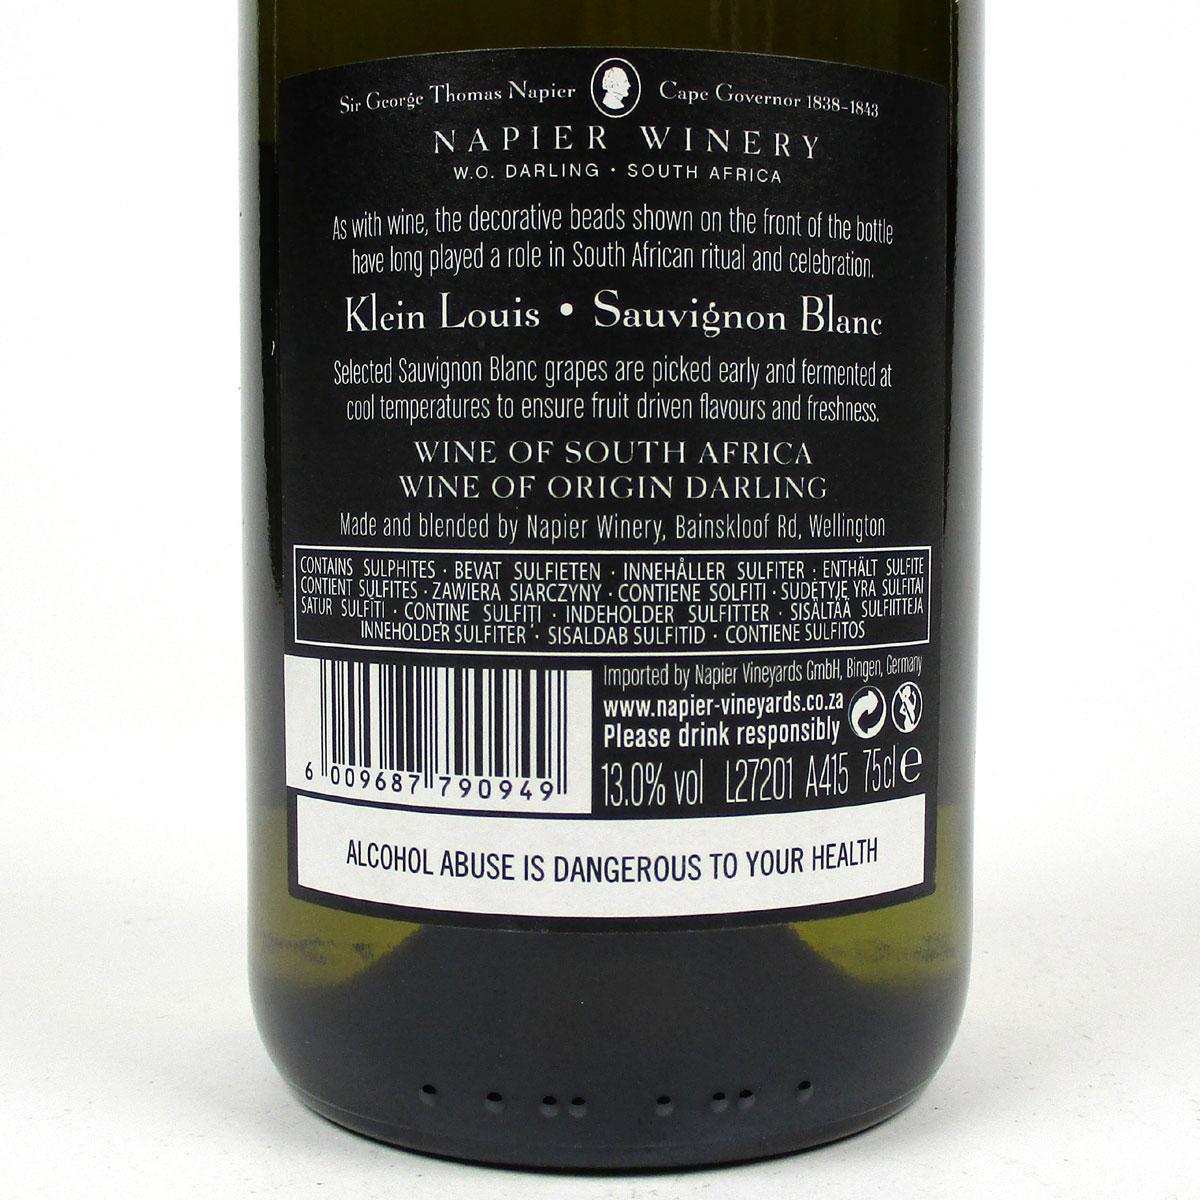 Napier Winery: 'Klein Louis' Sauvignon Blanc 2020 - Bottle rear Label